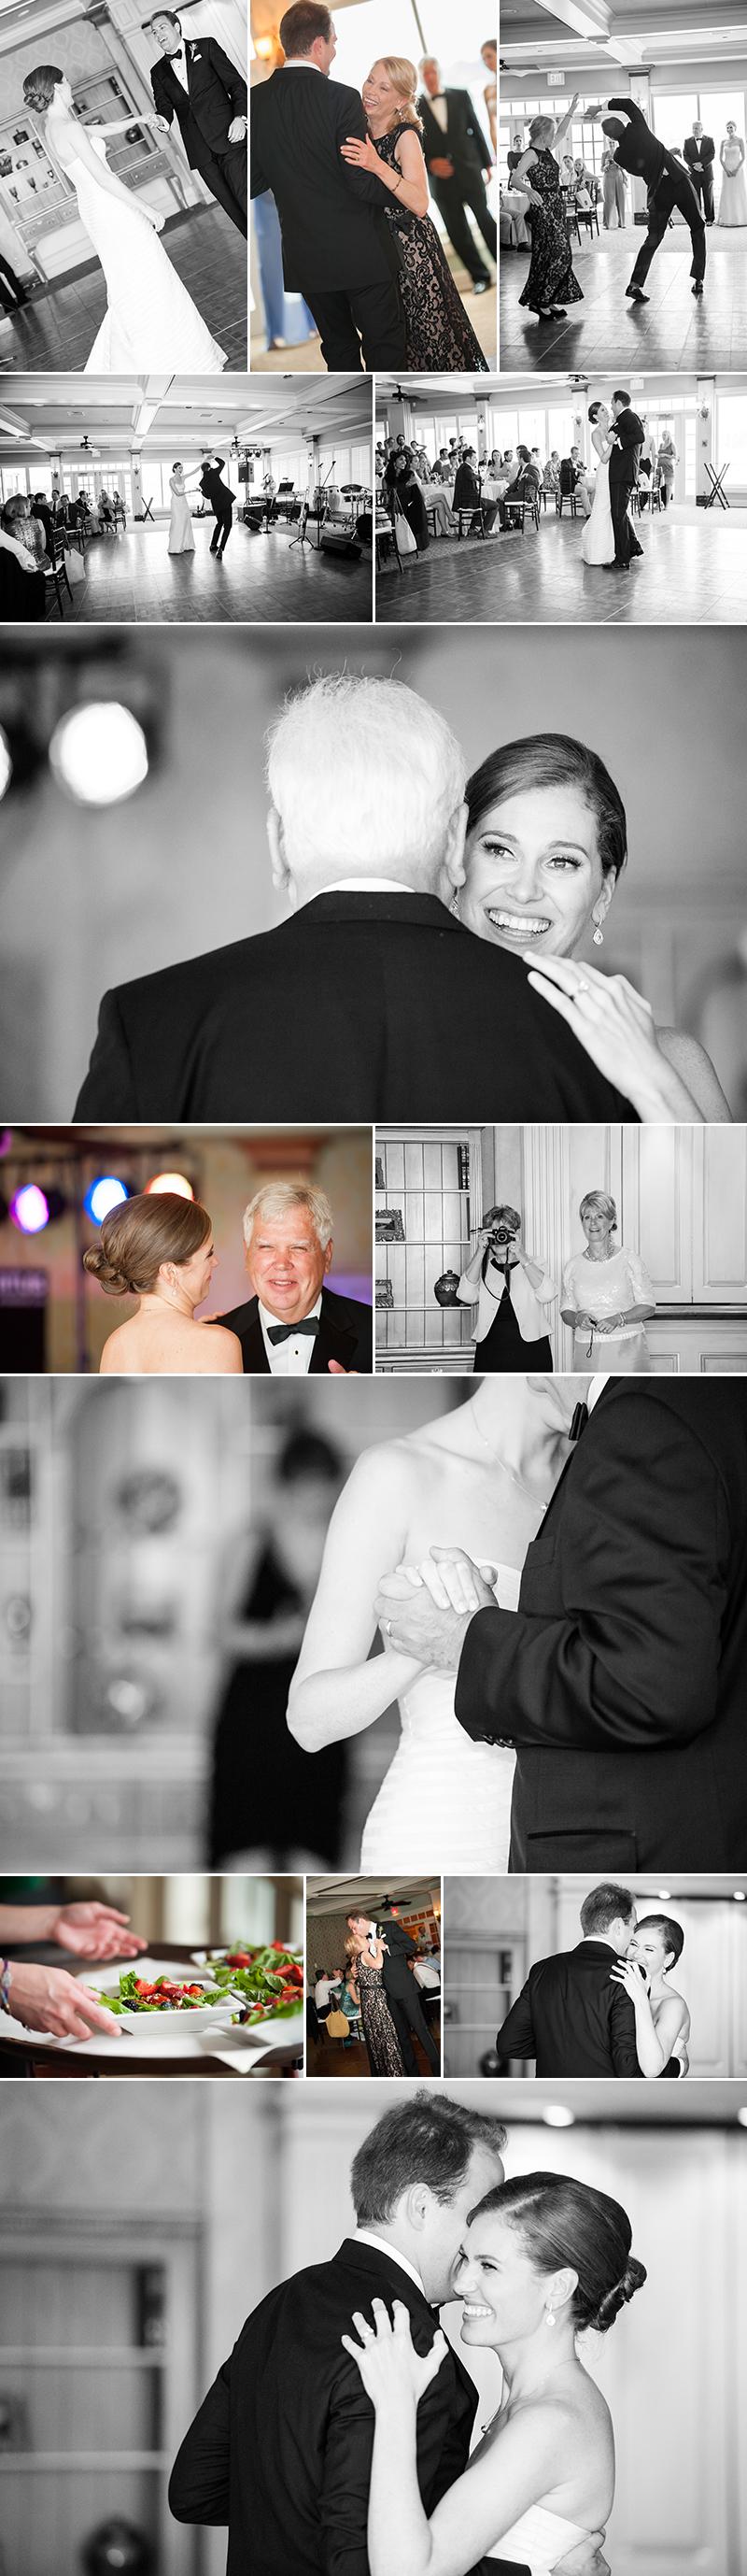 Blog Collage-1395770585417